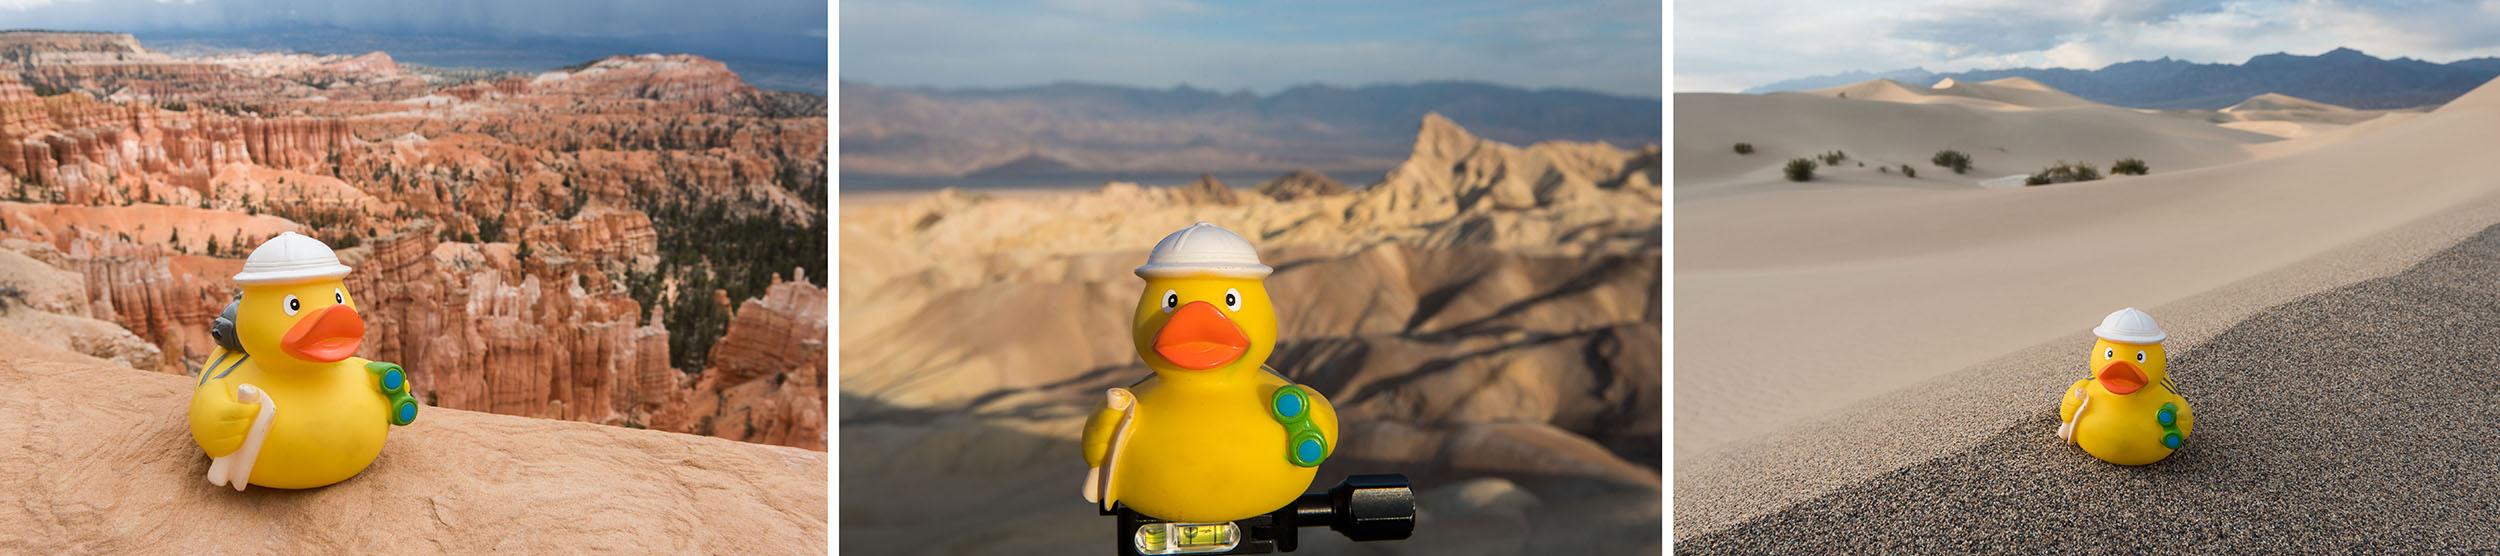 Ducky op reis - drieluik